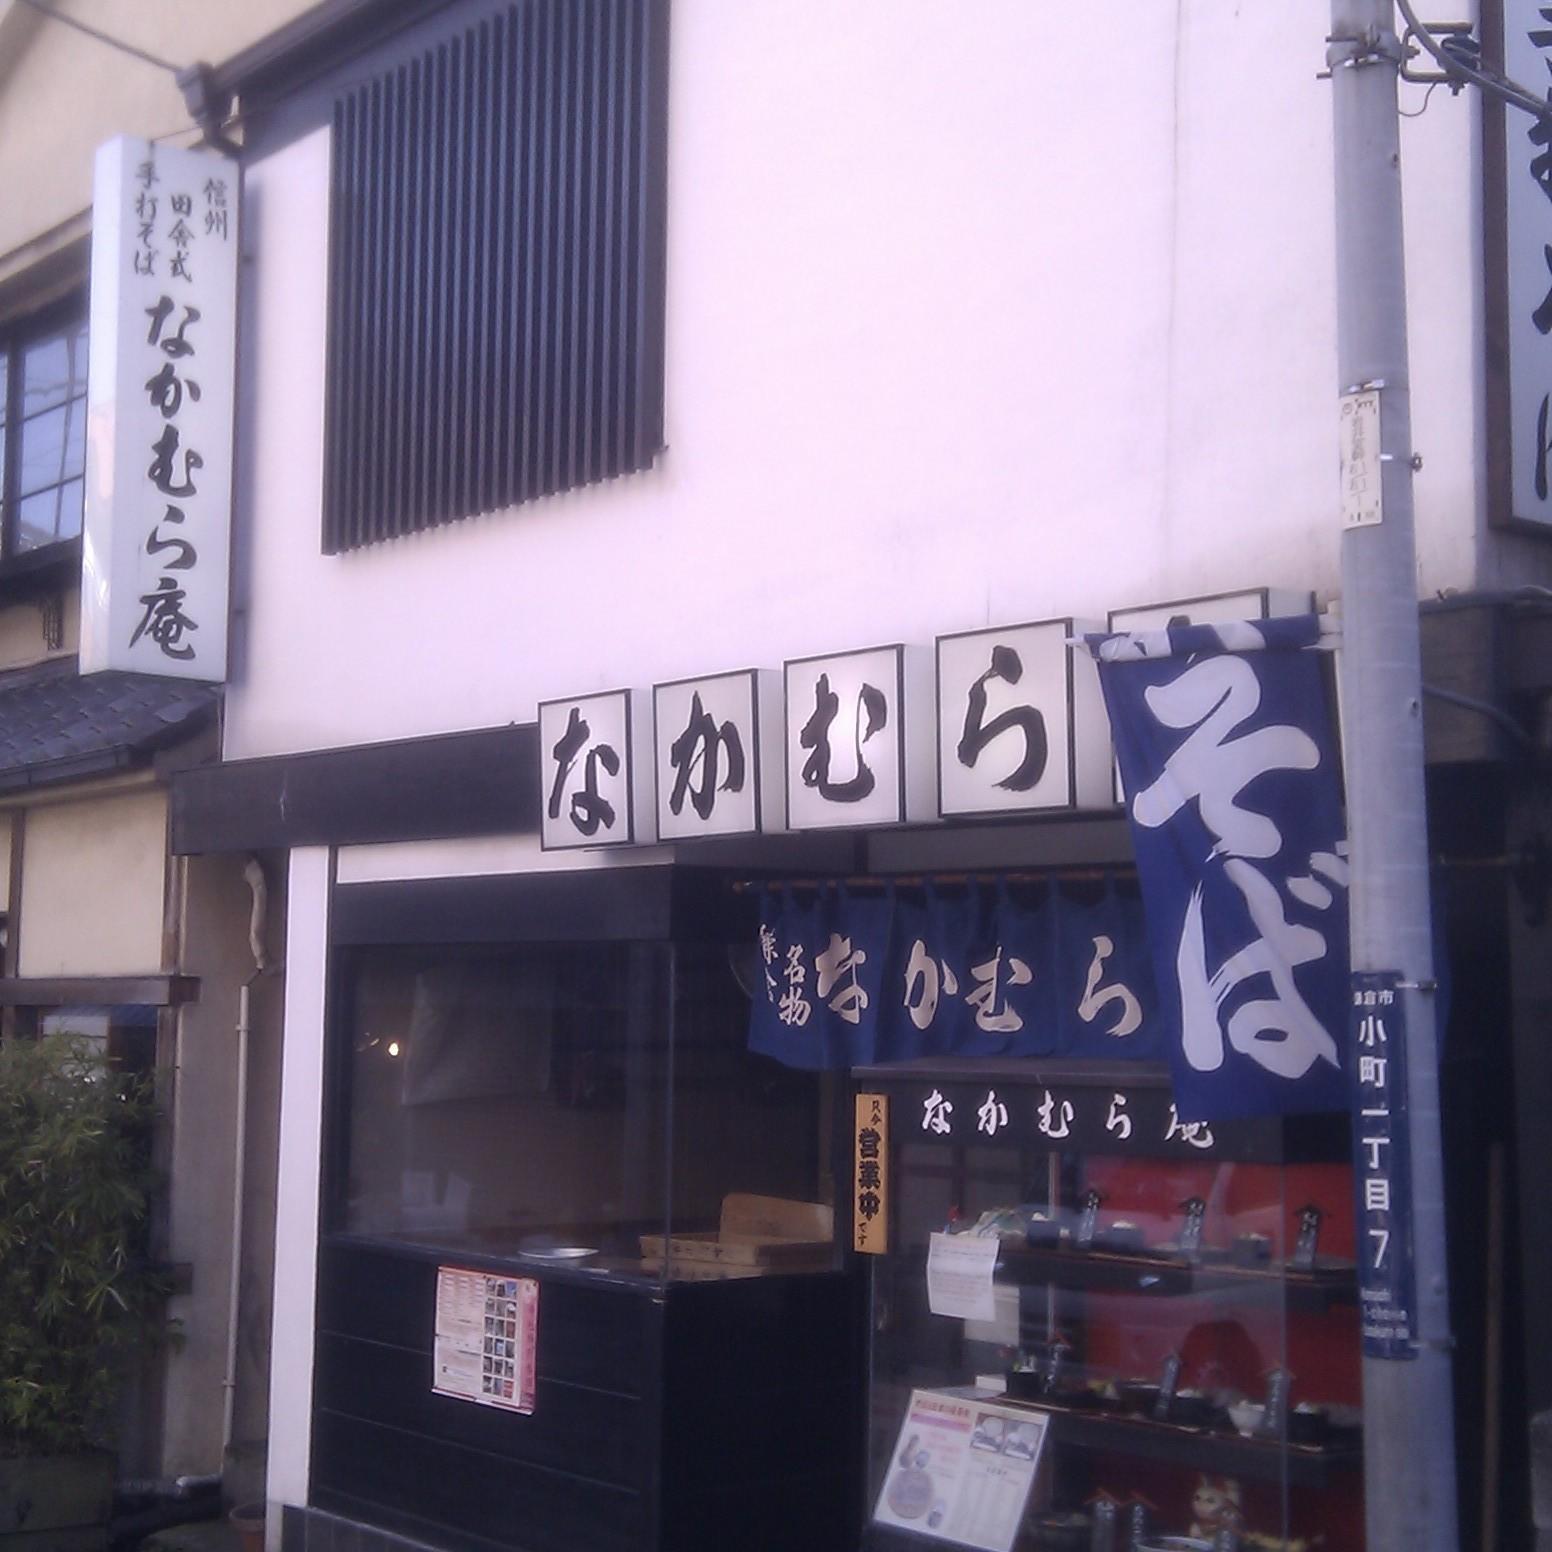 Nakamura-an